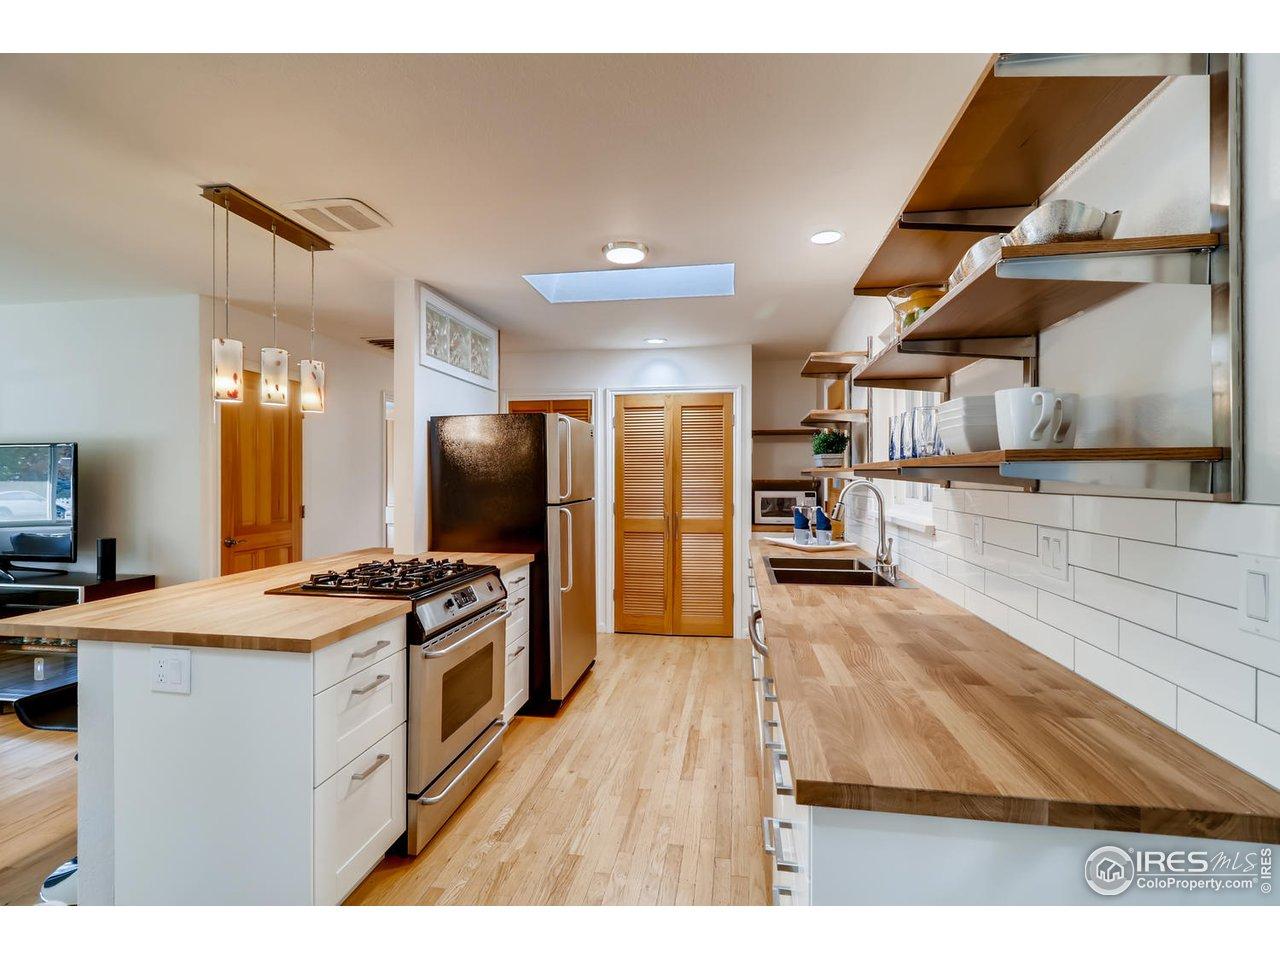 Brand new kitchen cabinets, shelving & countertops